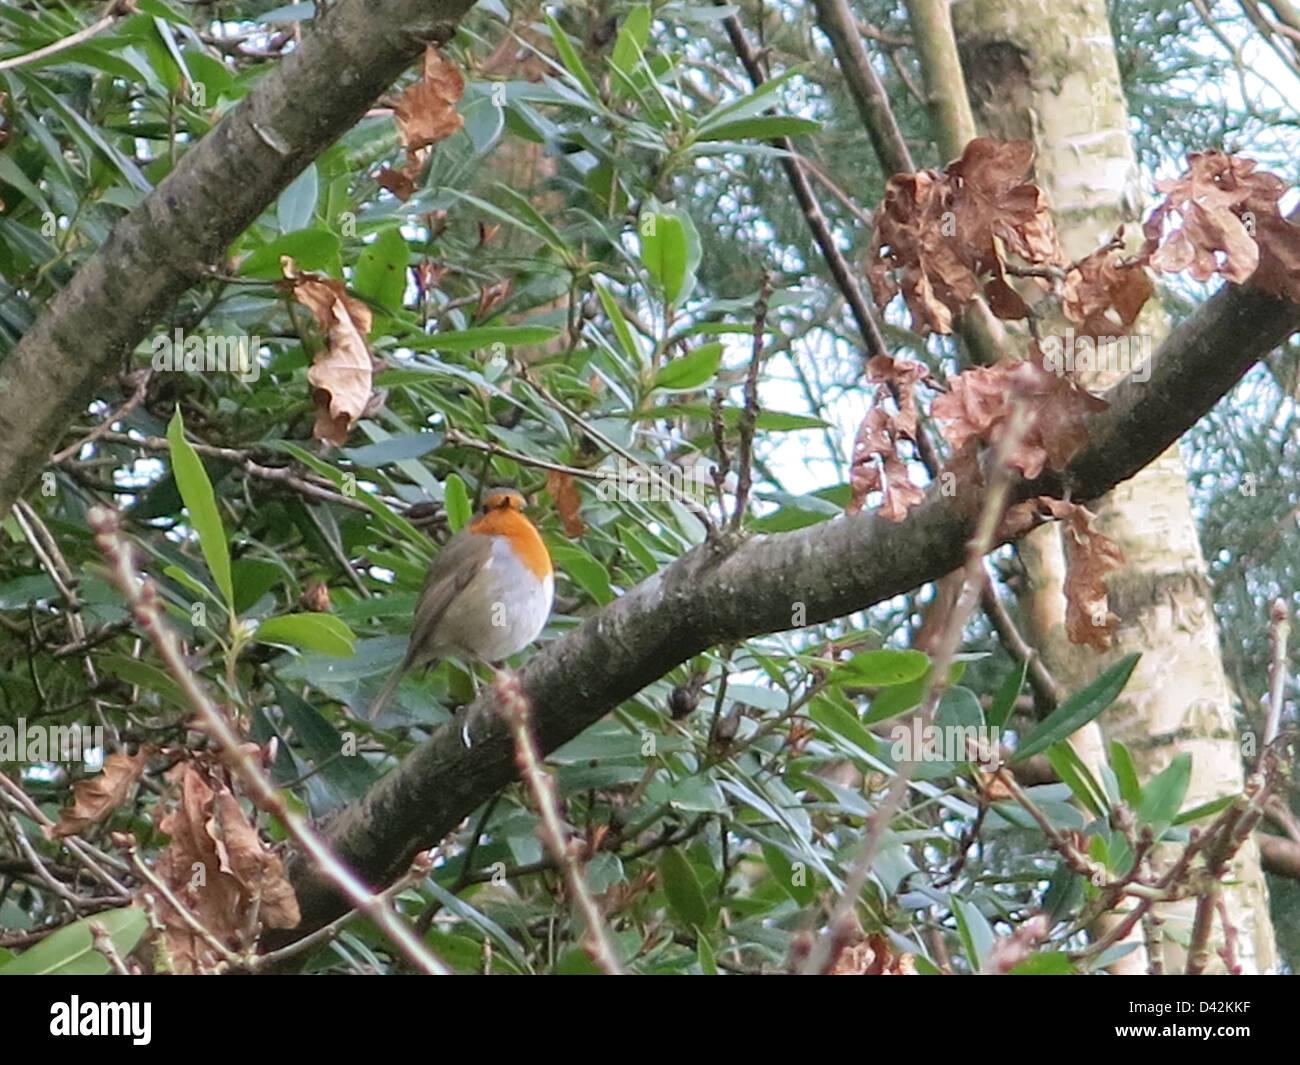 Robin the Gardeners Friend Feb 2013 - Stock Image